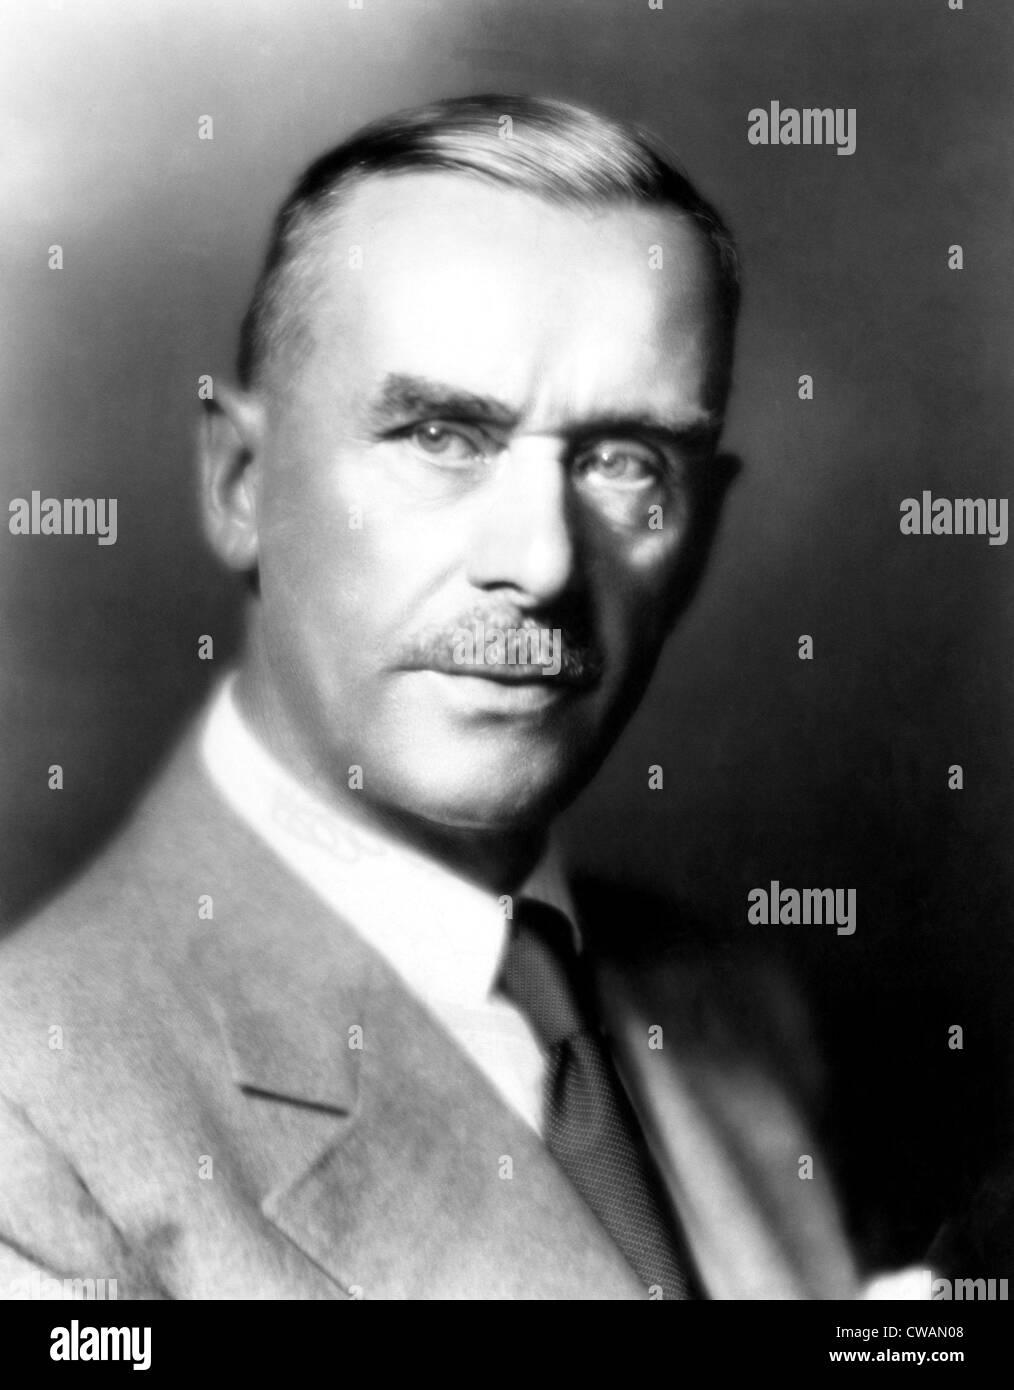 Thomas Mann (1875-1955), German novelist and Nobel Prize winner, circa 1930s. Courtesy: CSU Archives/Everett Collection - Stock Image